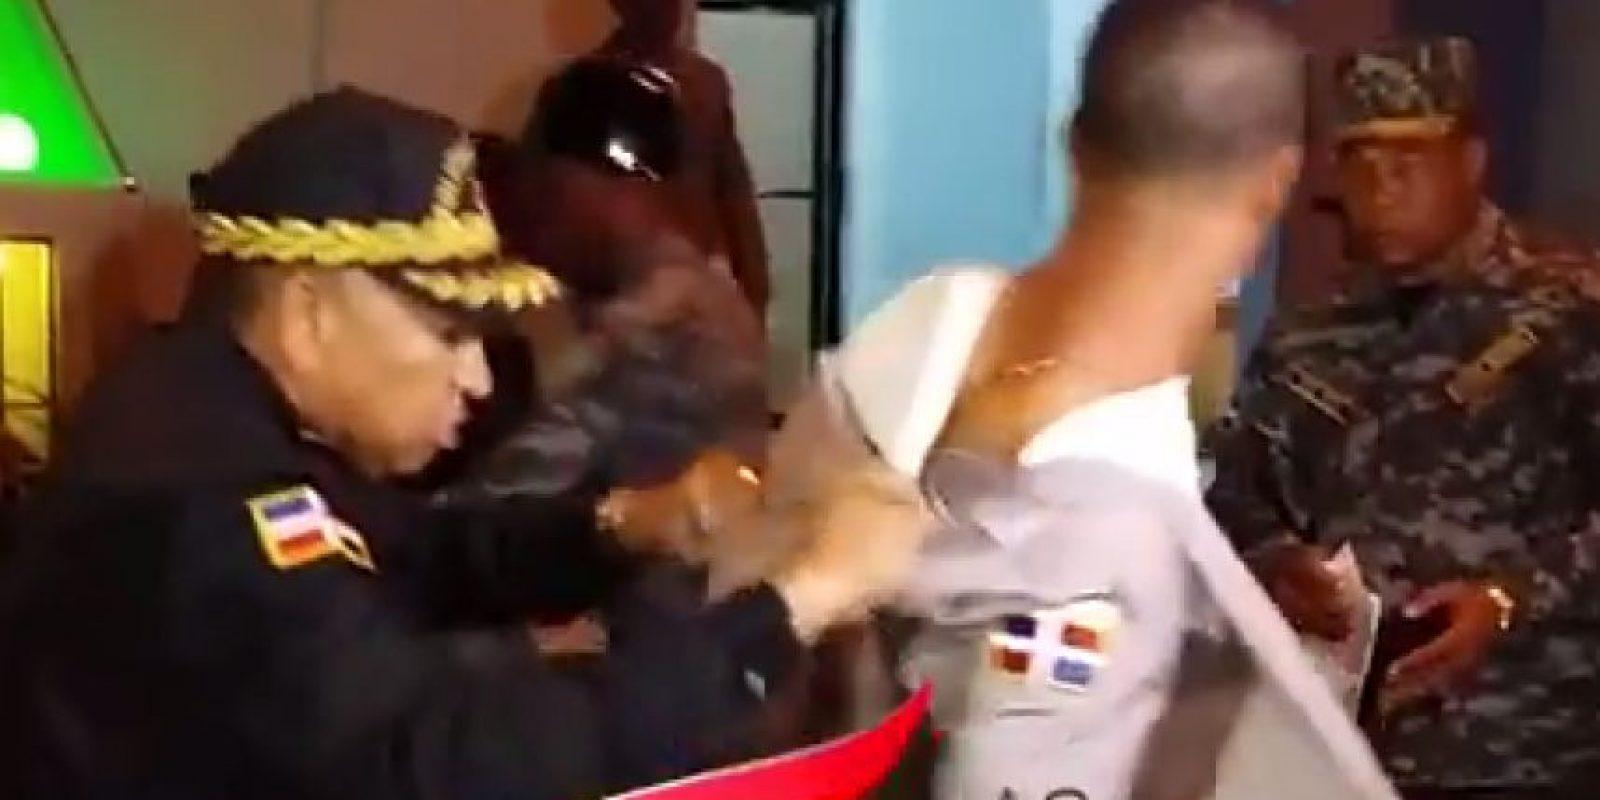 Policía expulsa de manera deshonrosa a dos agentes Foto:Fuente Externa